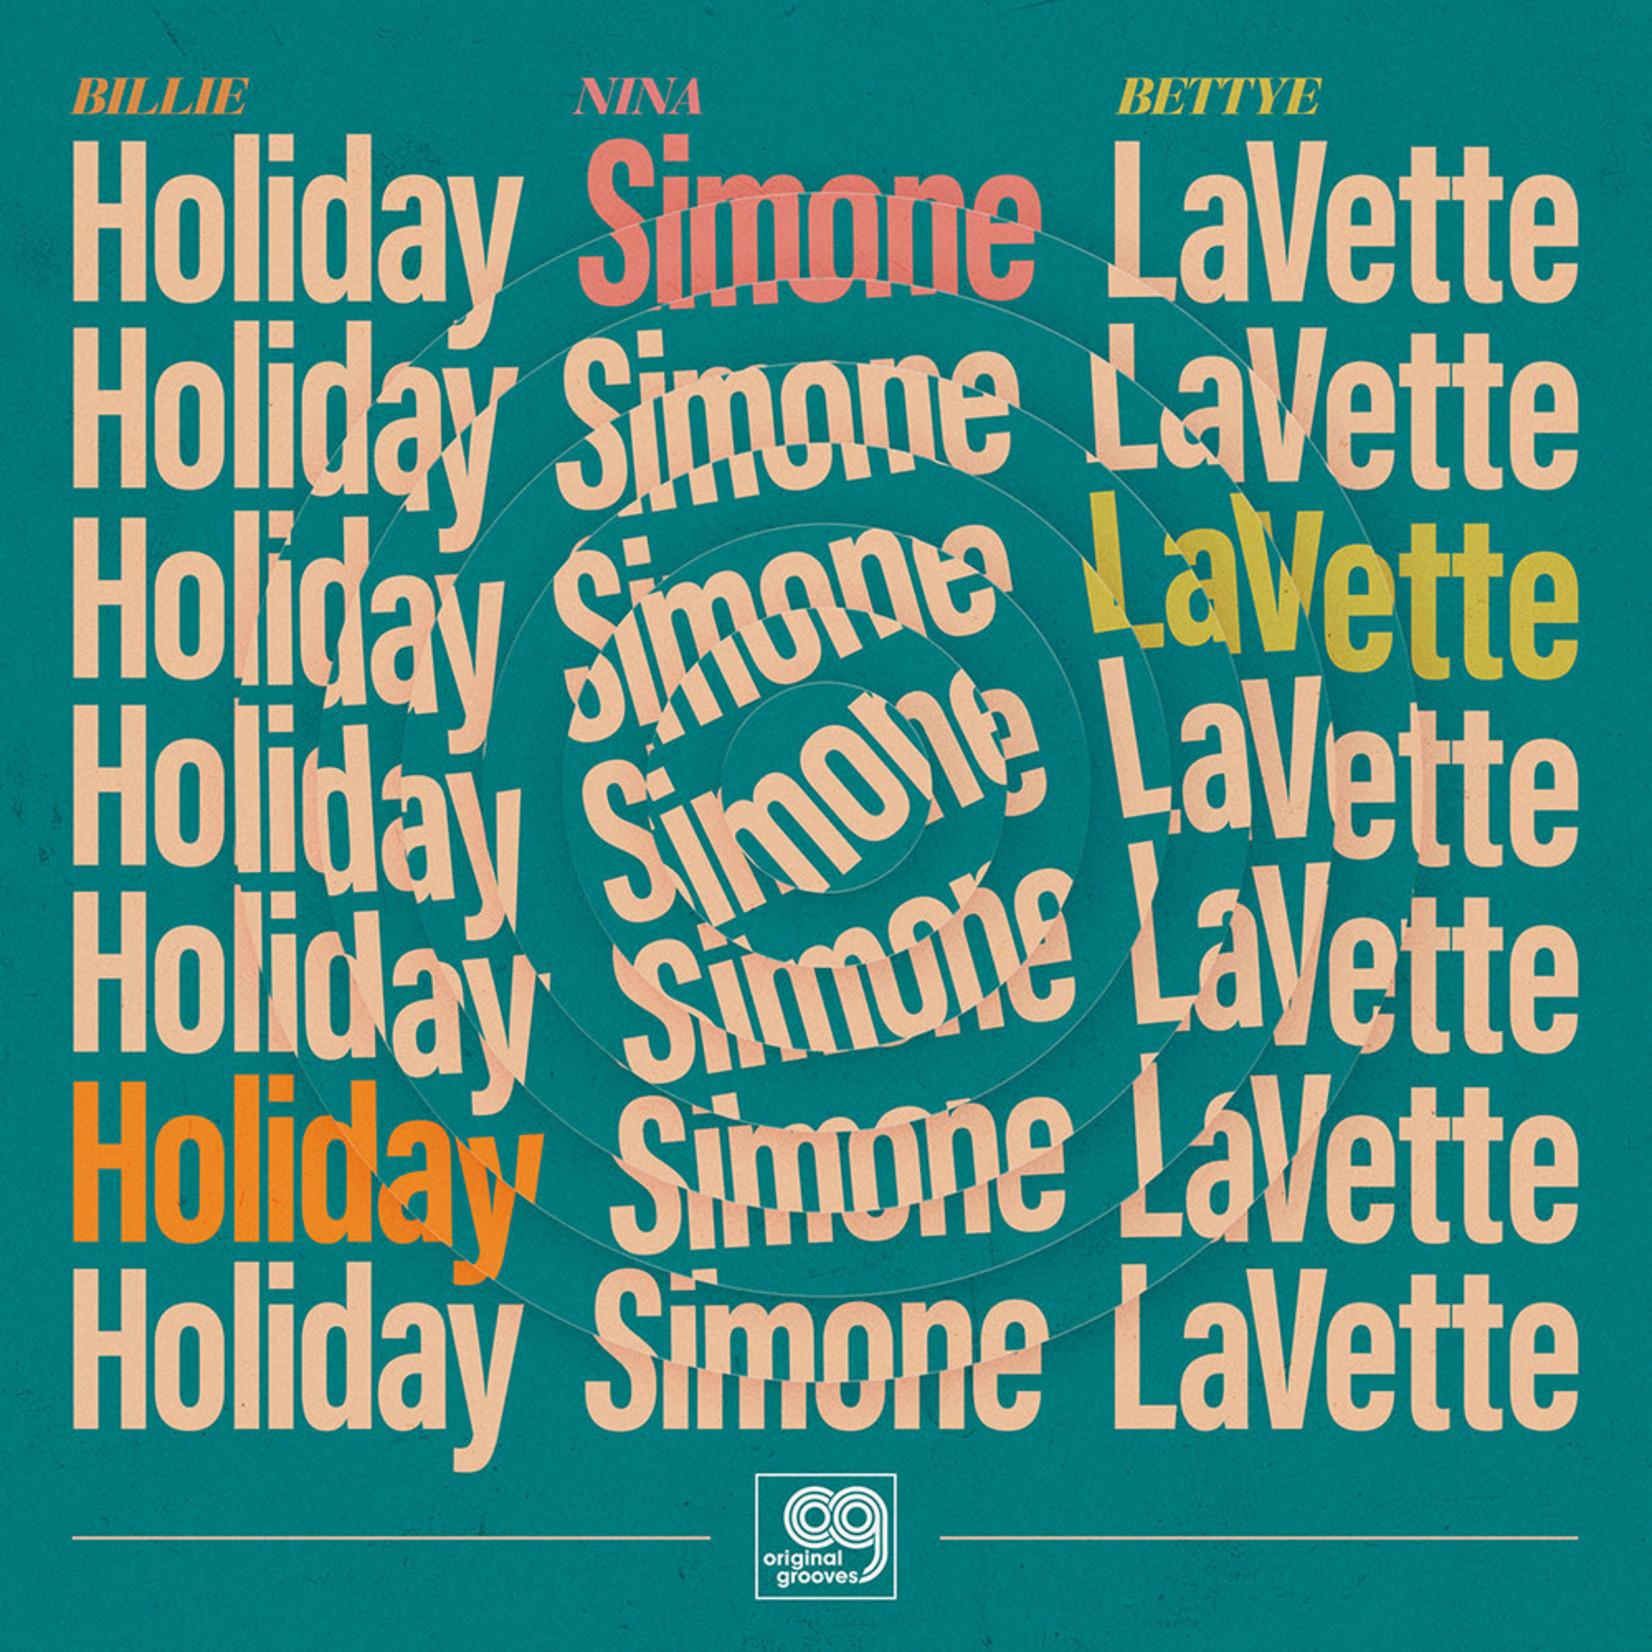 "BILLIE HOLIDAY BF20 - ORIGINAL GROOVES: BILLIE HOLIDAY, NINA SIMONE, BETTYE LAVETTE 12"" SINGLE"